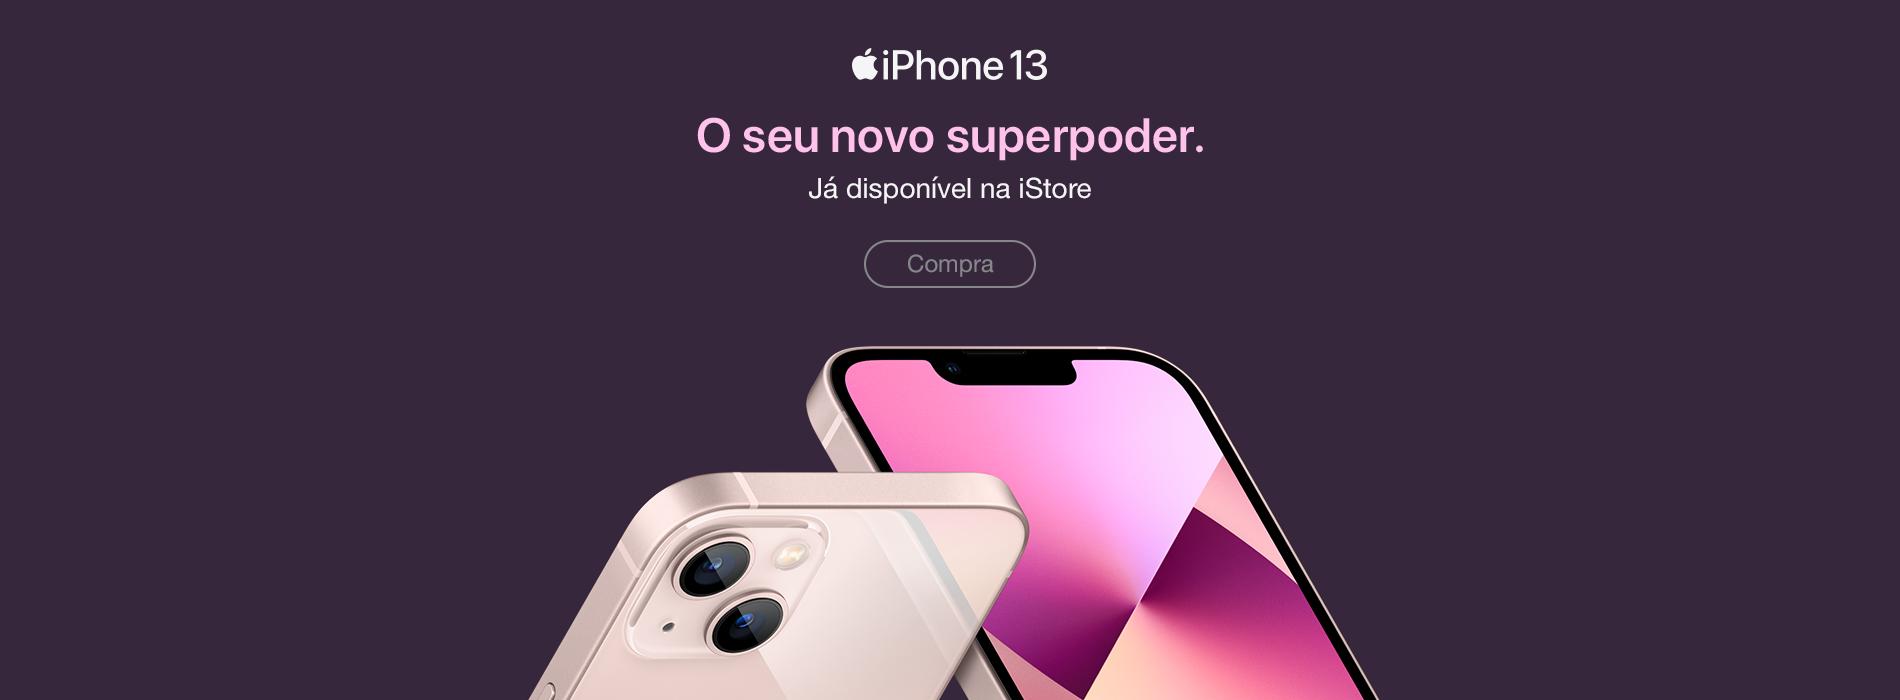 NPI - Disponível - iPhone 13